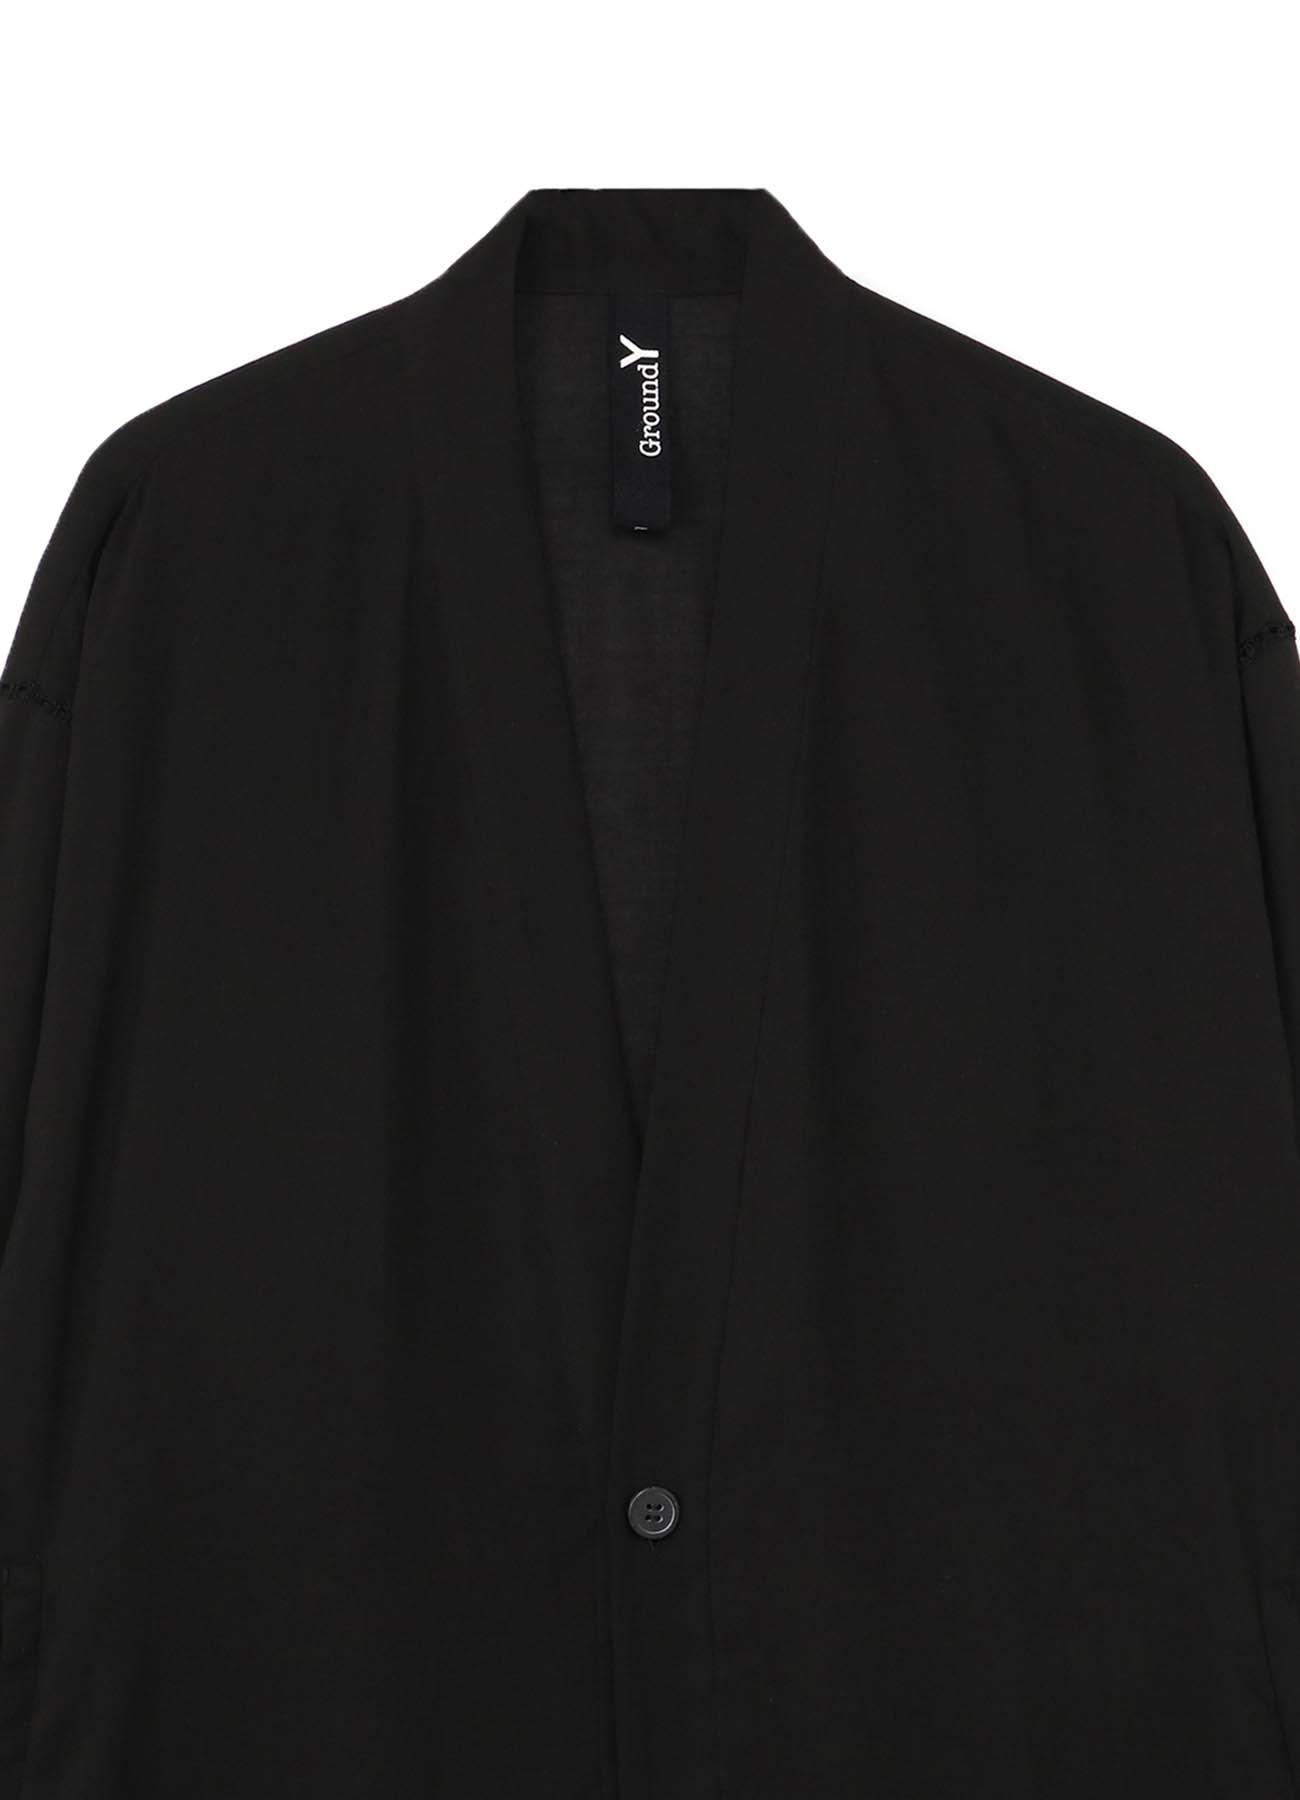 Tencel Lawn One Button Cardigan